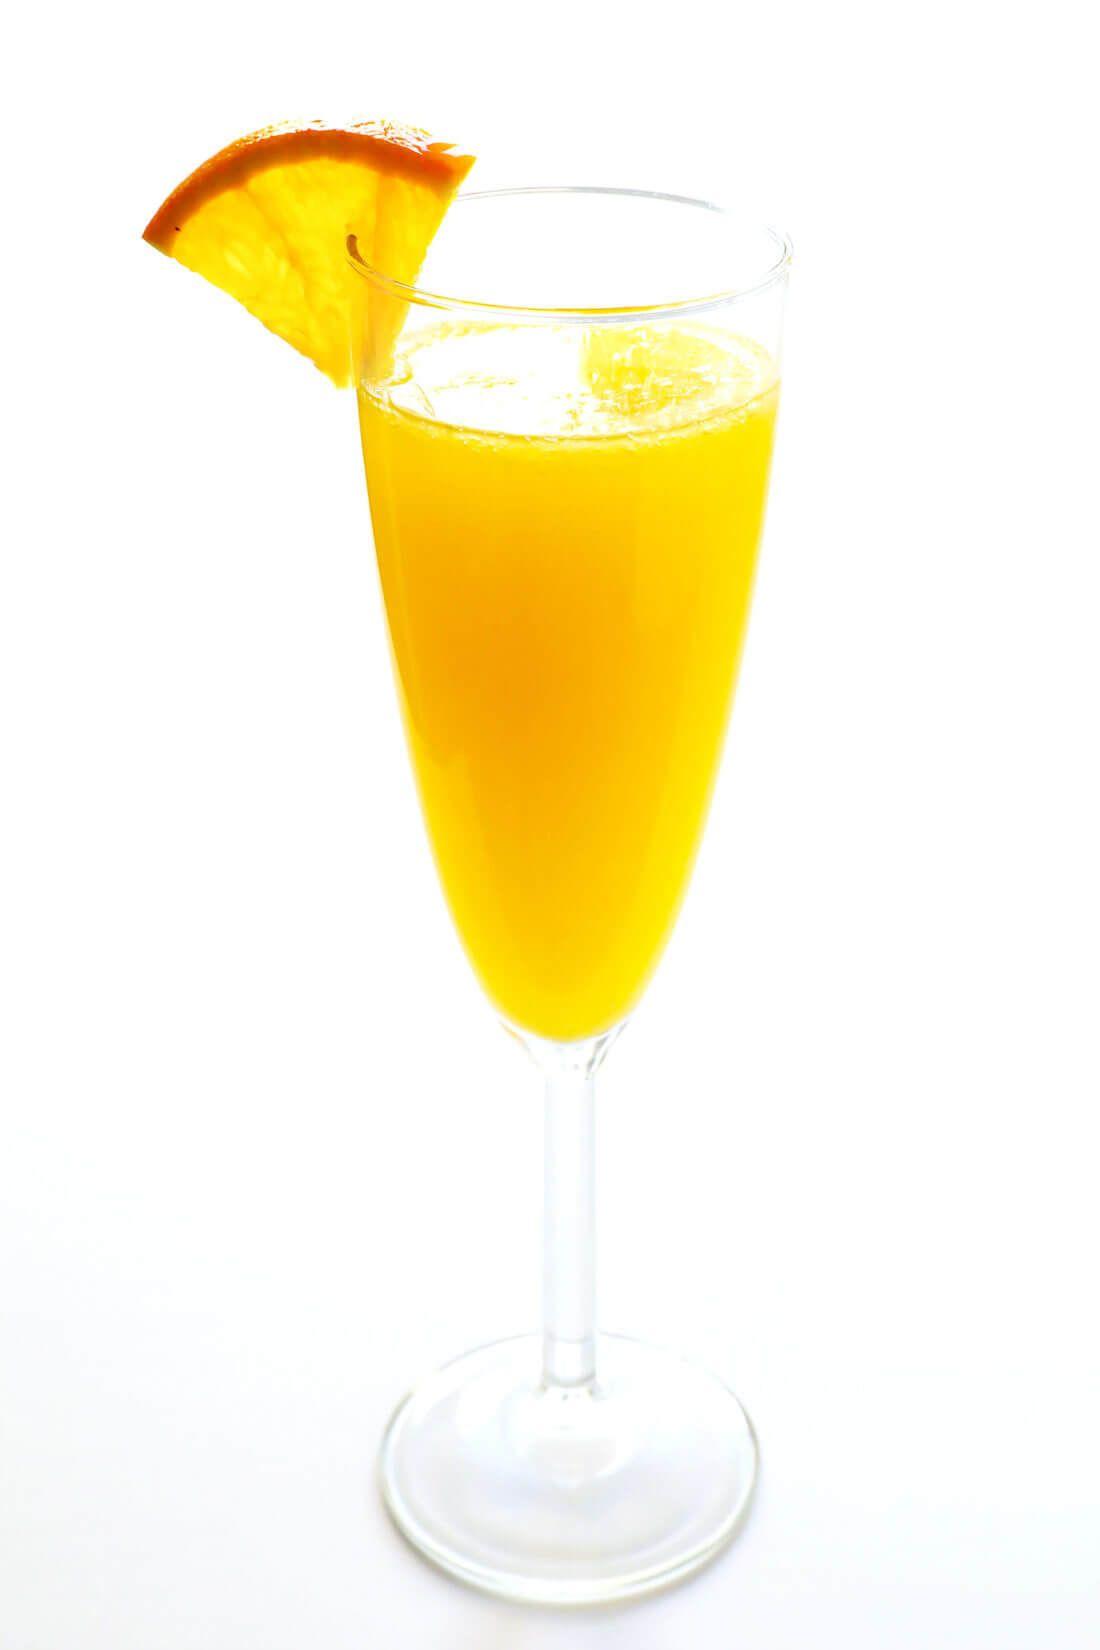 The Best Mimosa Recipe Mimosa Recipe Best Mimosa Recipe Champagne Drinks